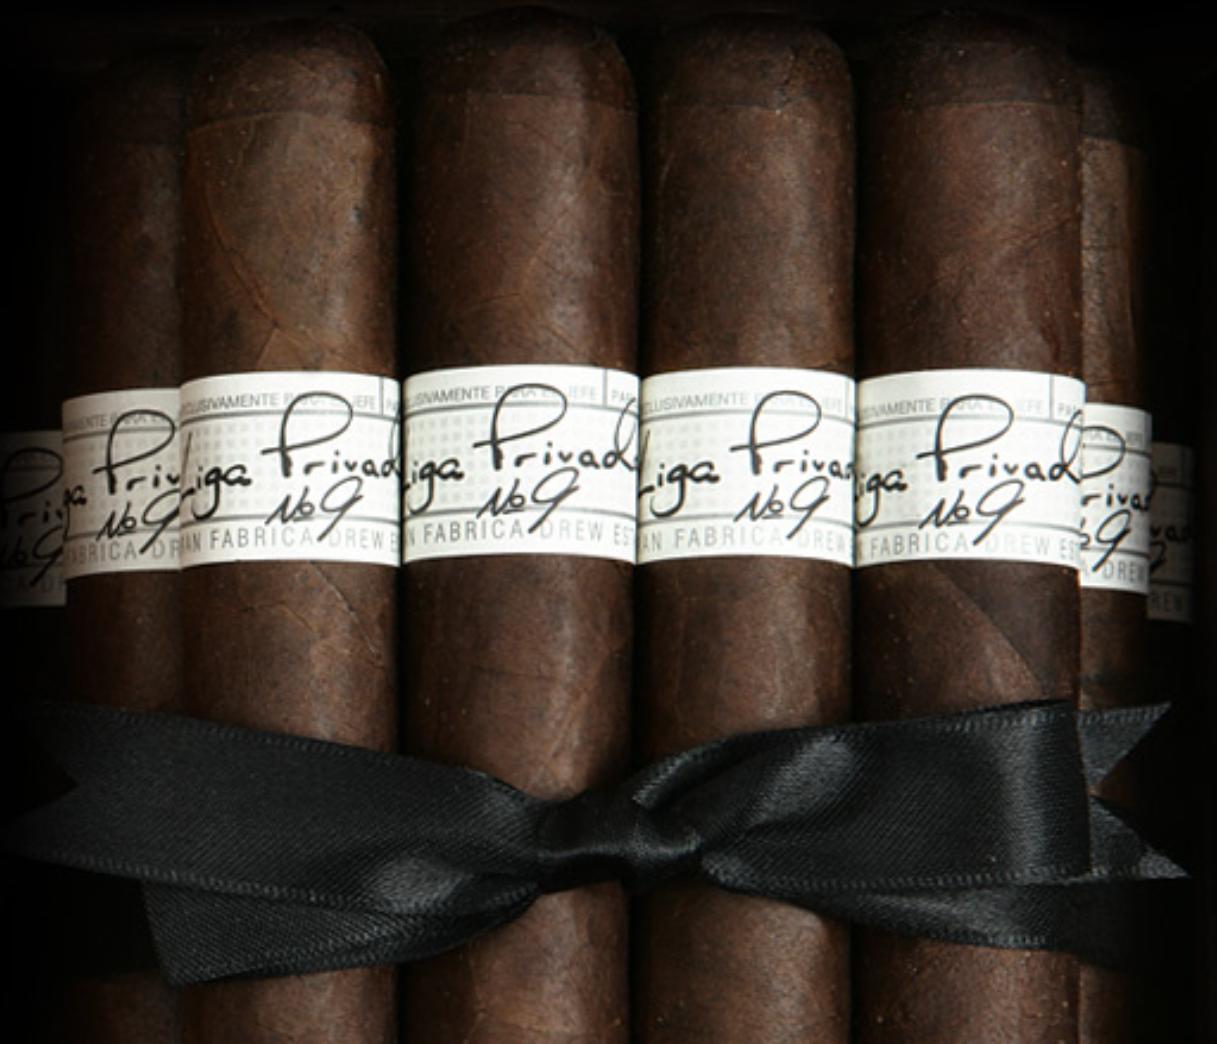 Liga Privada bundle of cigars